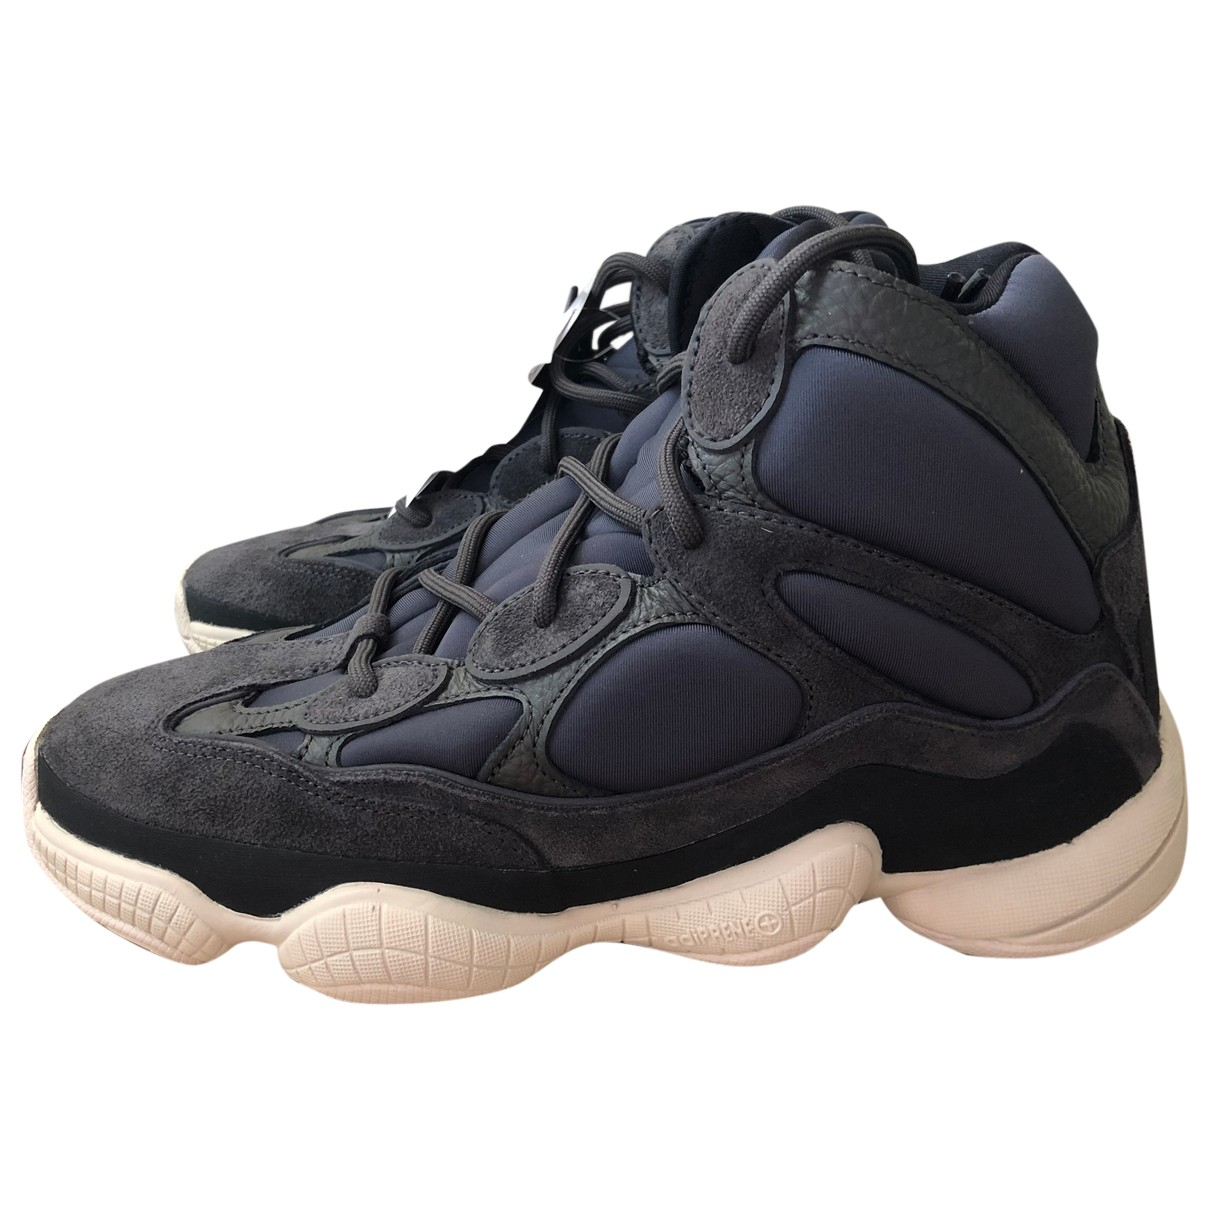 Yeezy X Adidas - Baskets 500 pour homme en toile - bleu